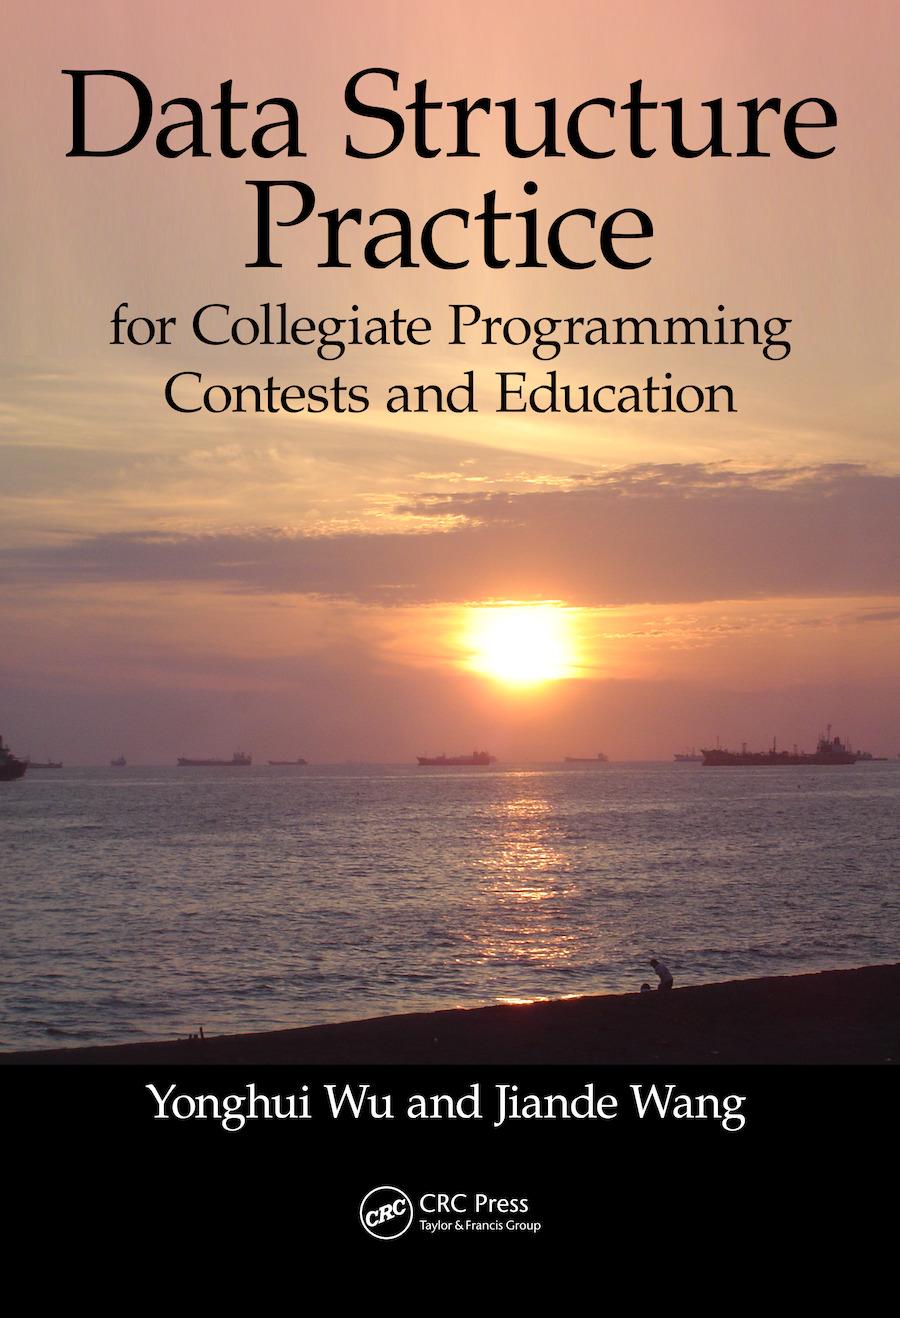 Data Structure Practice